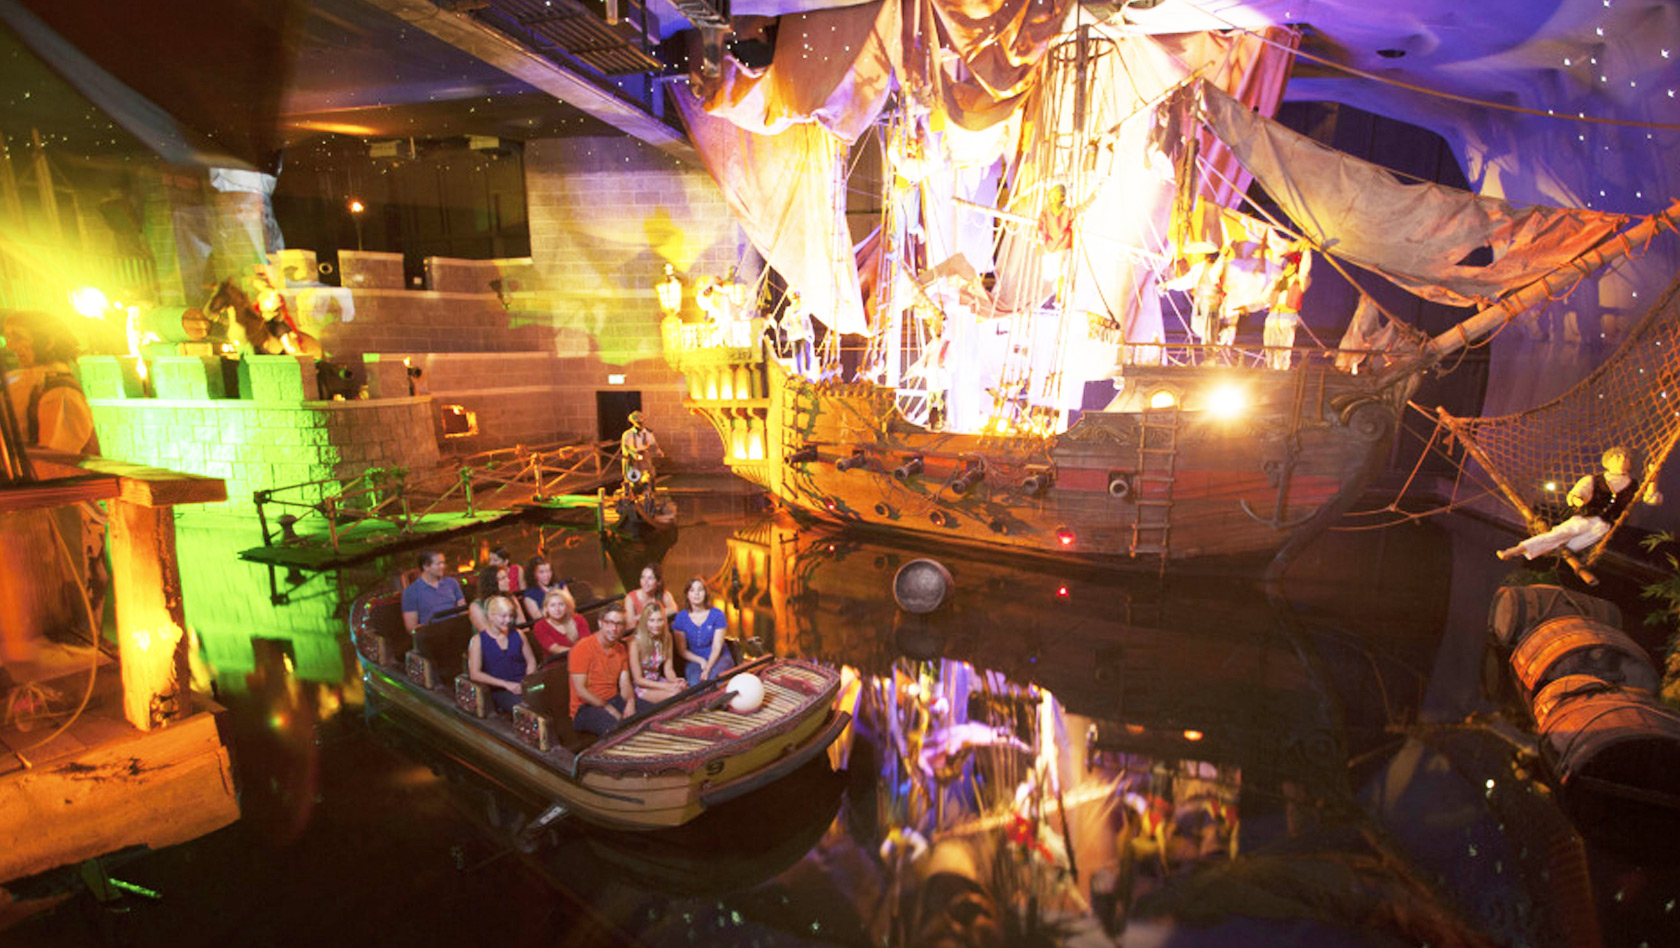 Piraten in Batavia Europa-Park Wasser-Bootfahrt